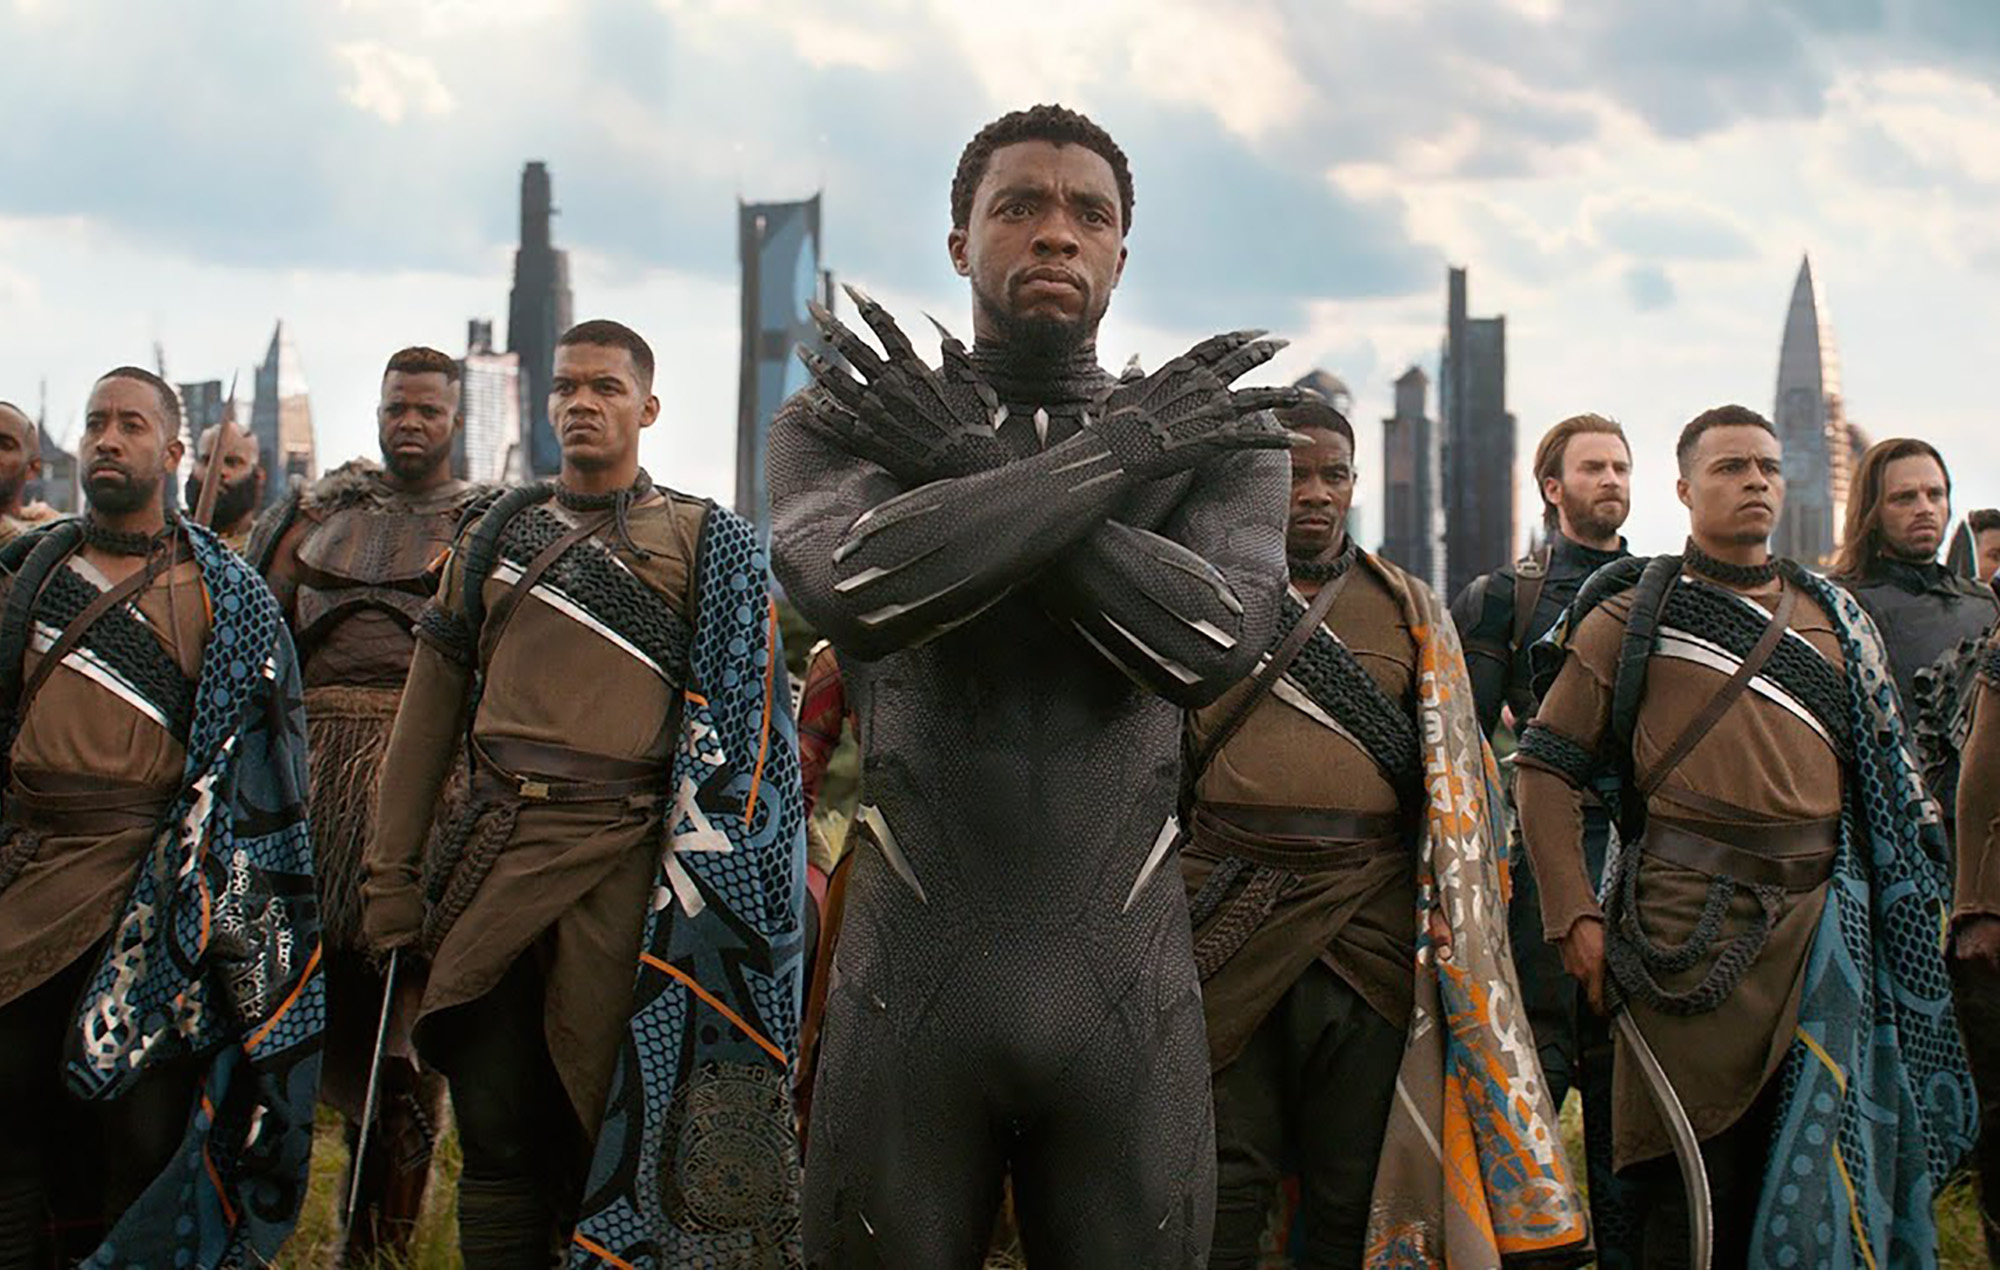 Black Panther' producer shares emotional final text from Chadwick Boseman - NaijaRewards